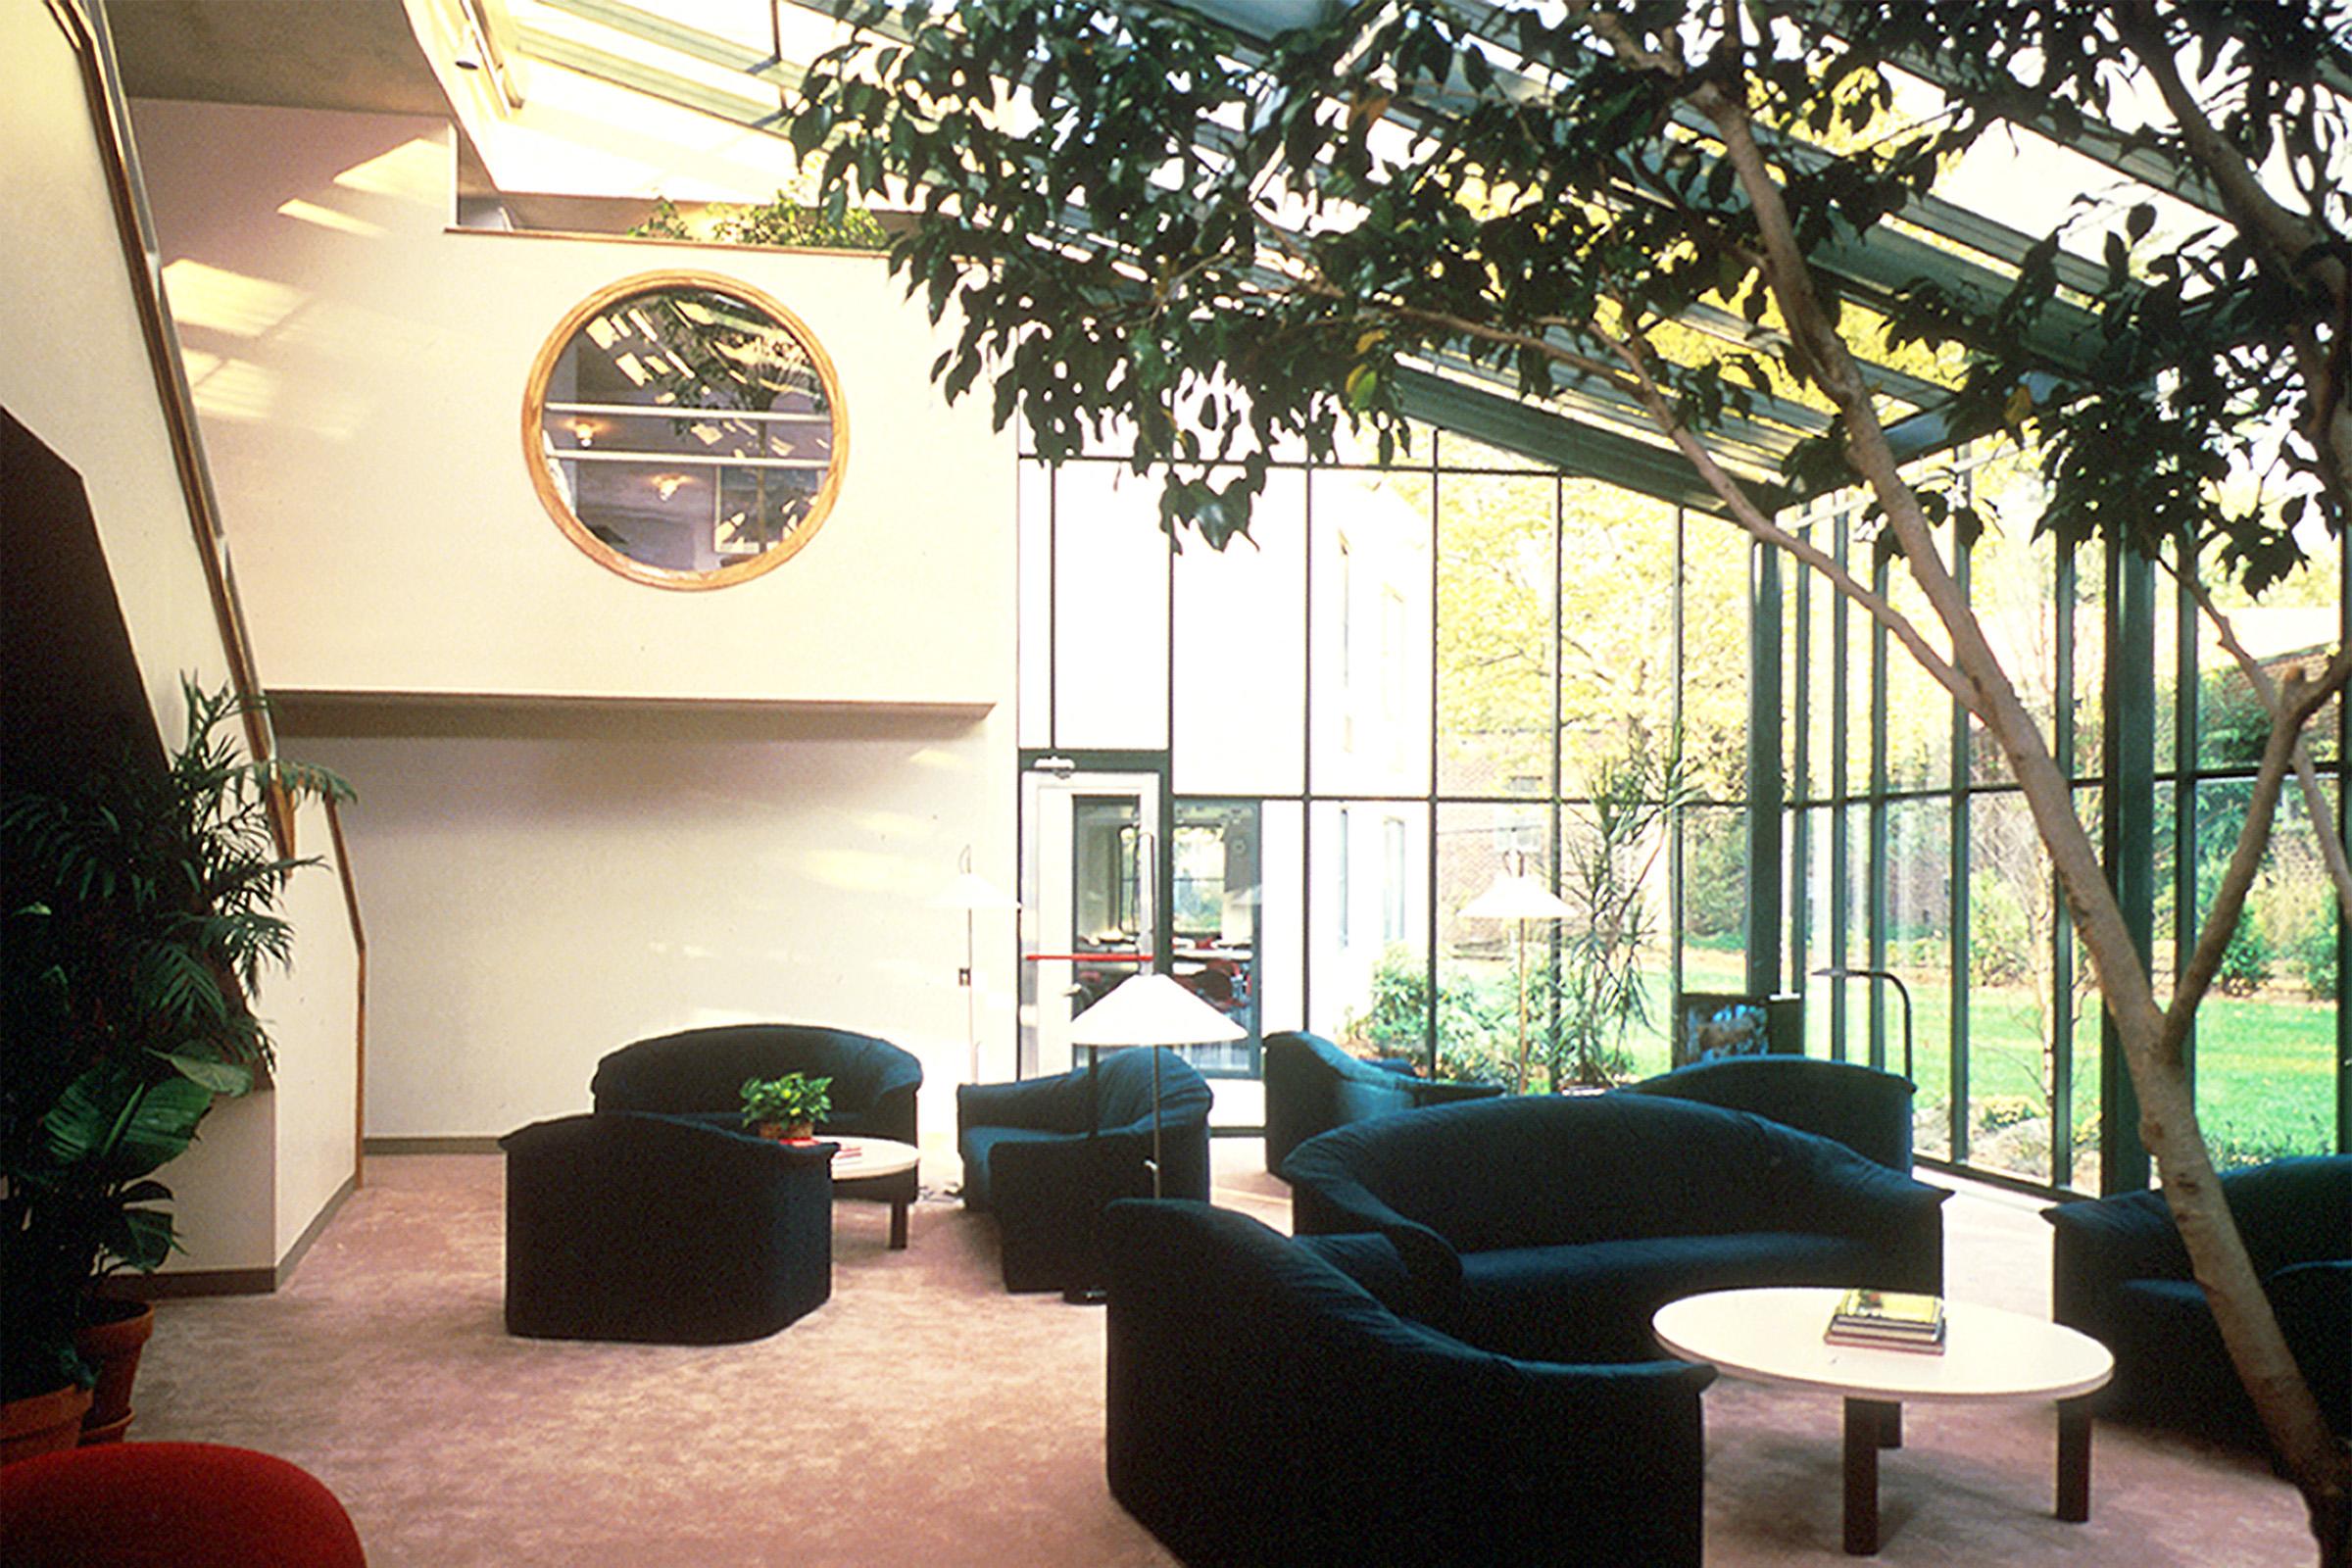 Interior View 3 - Greenhouse.jpg